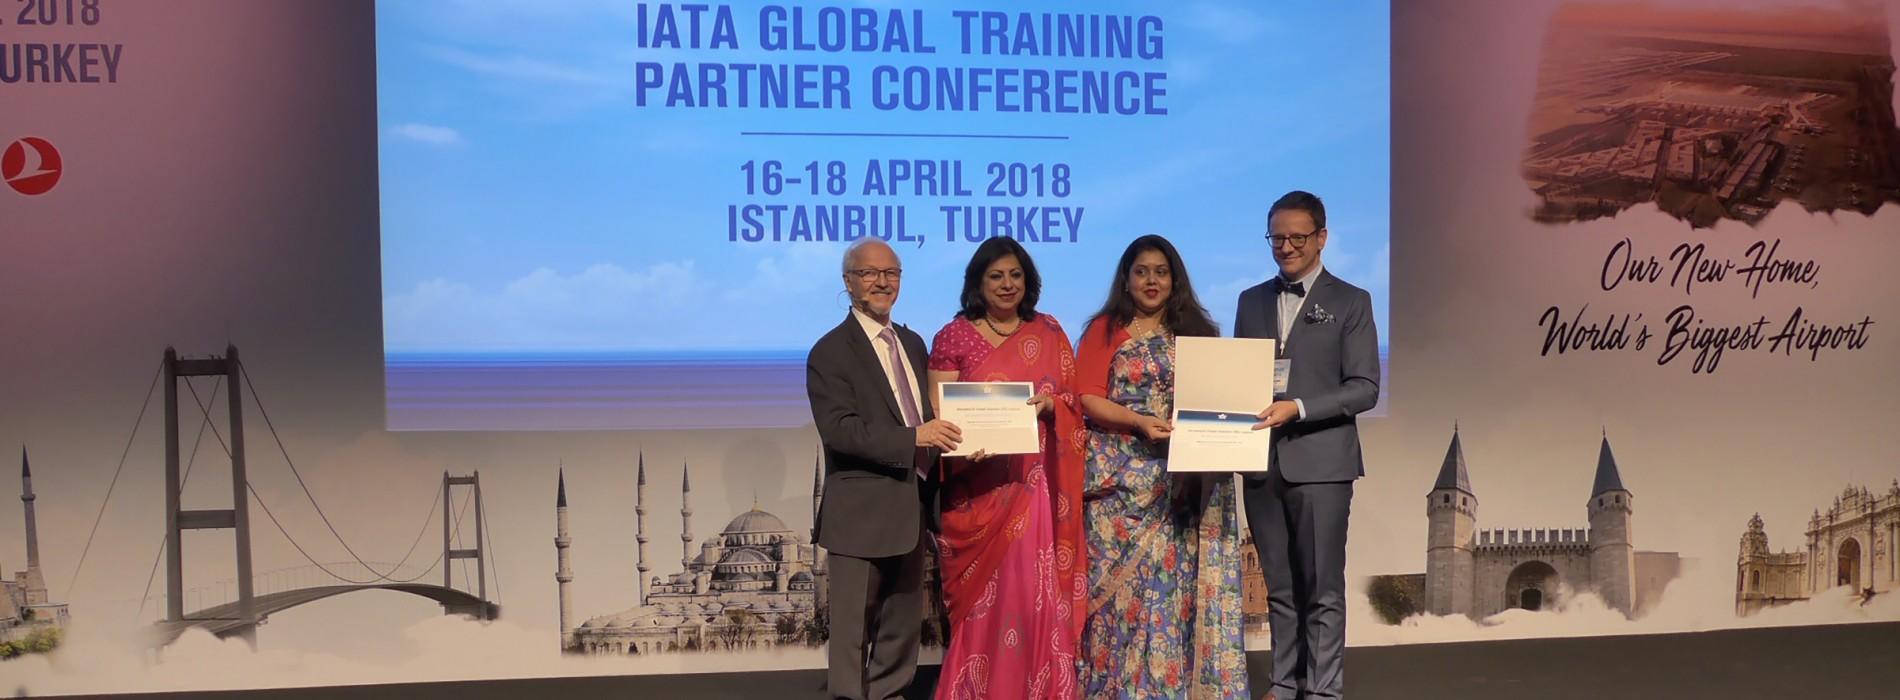 Bird Academy awarded IATA 2018 Regional top performer award